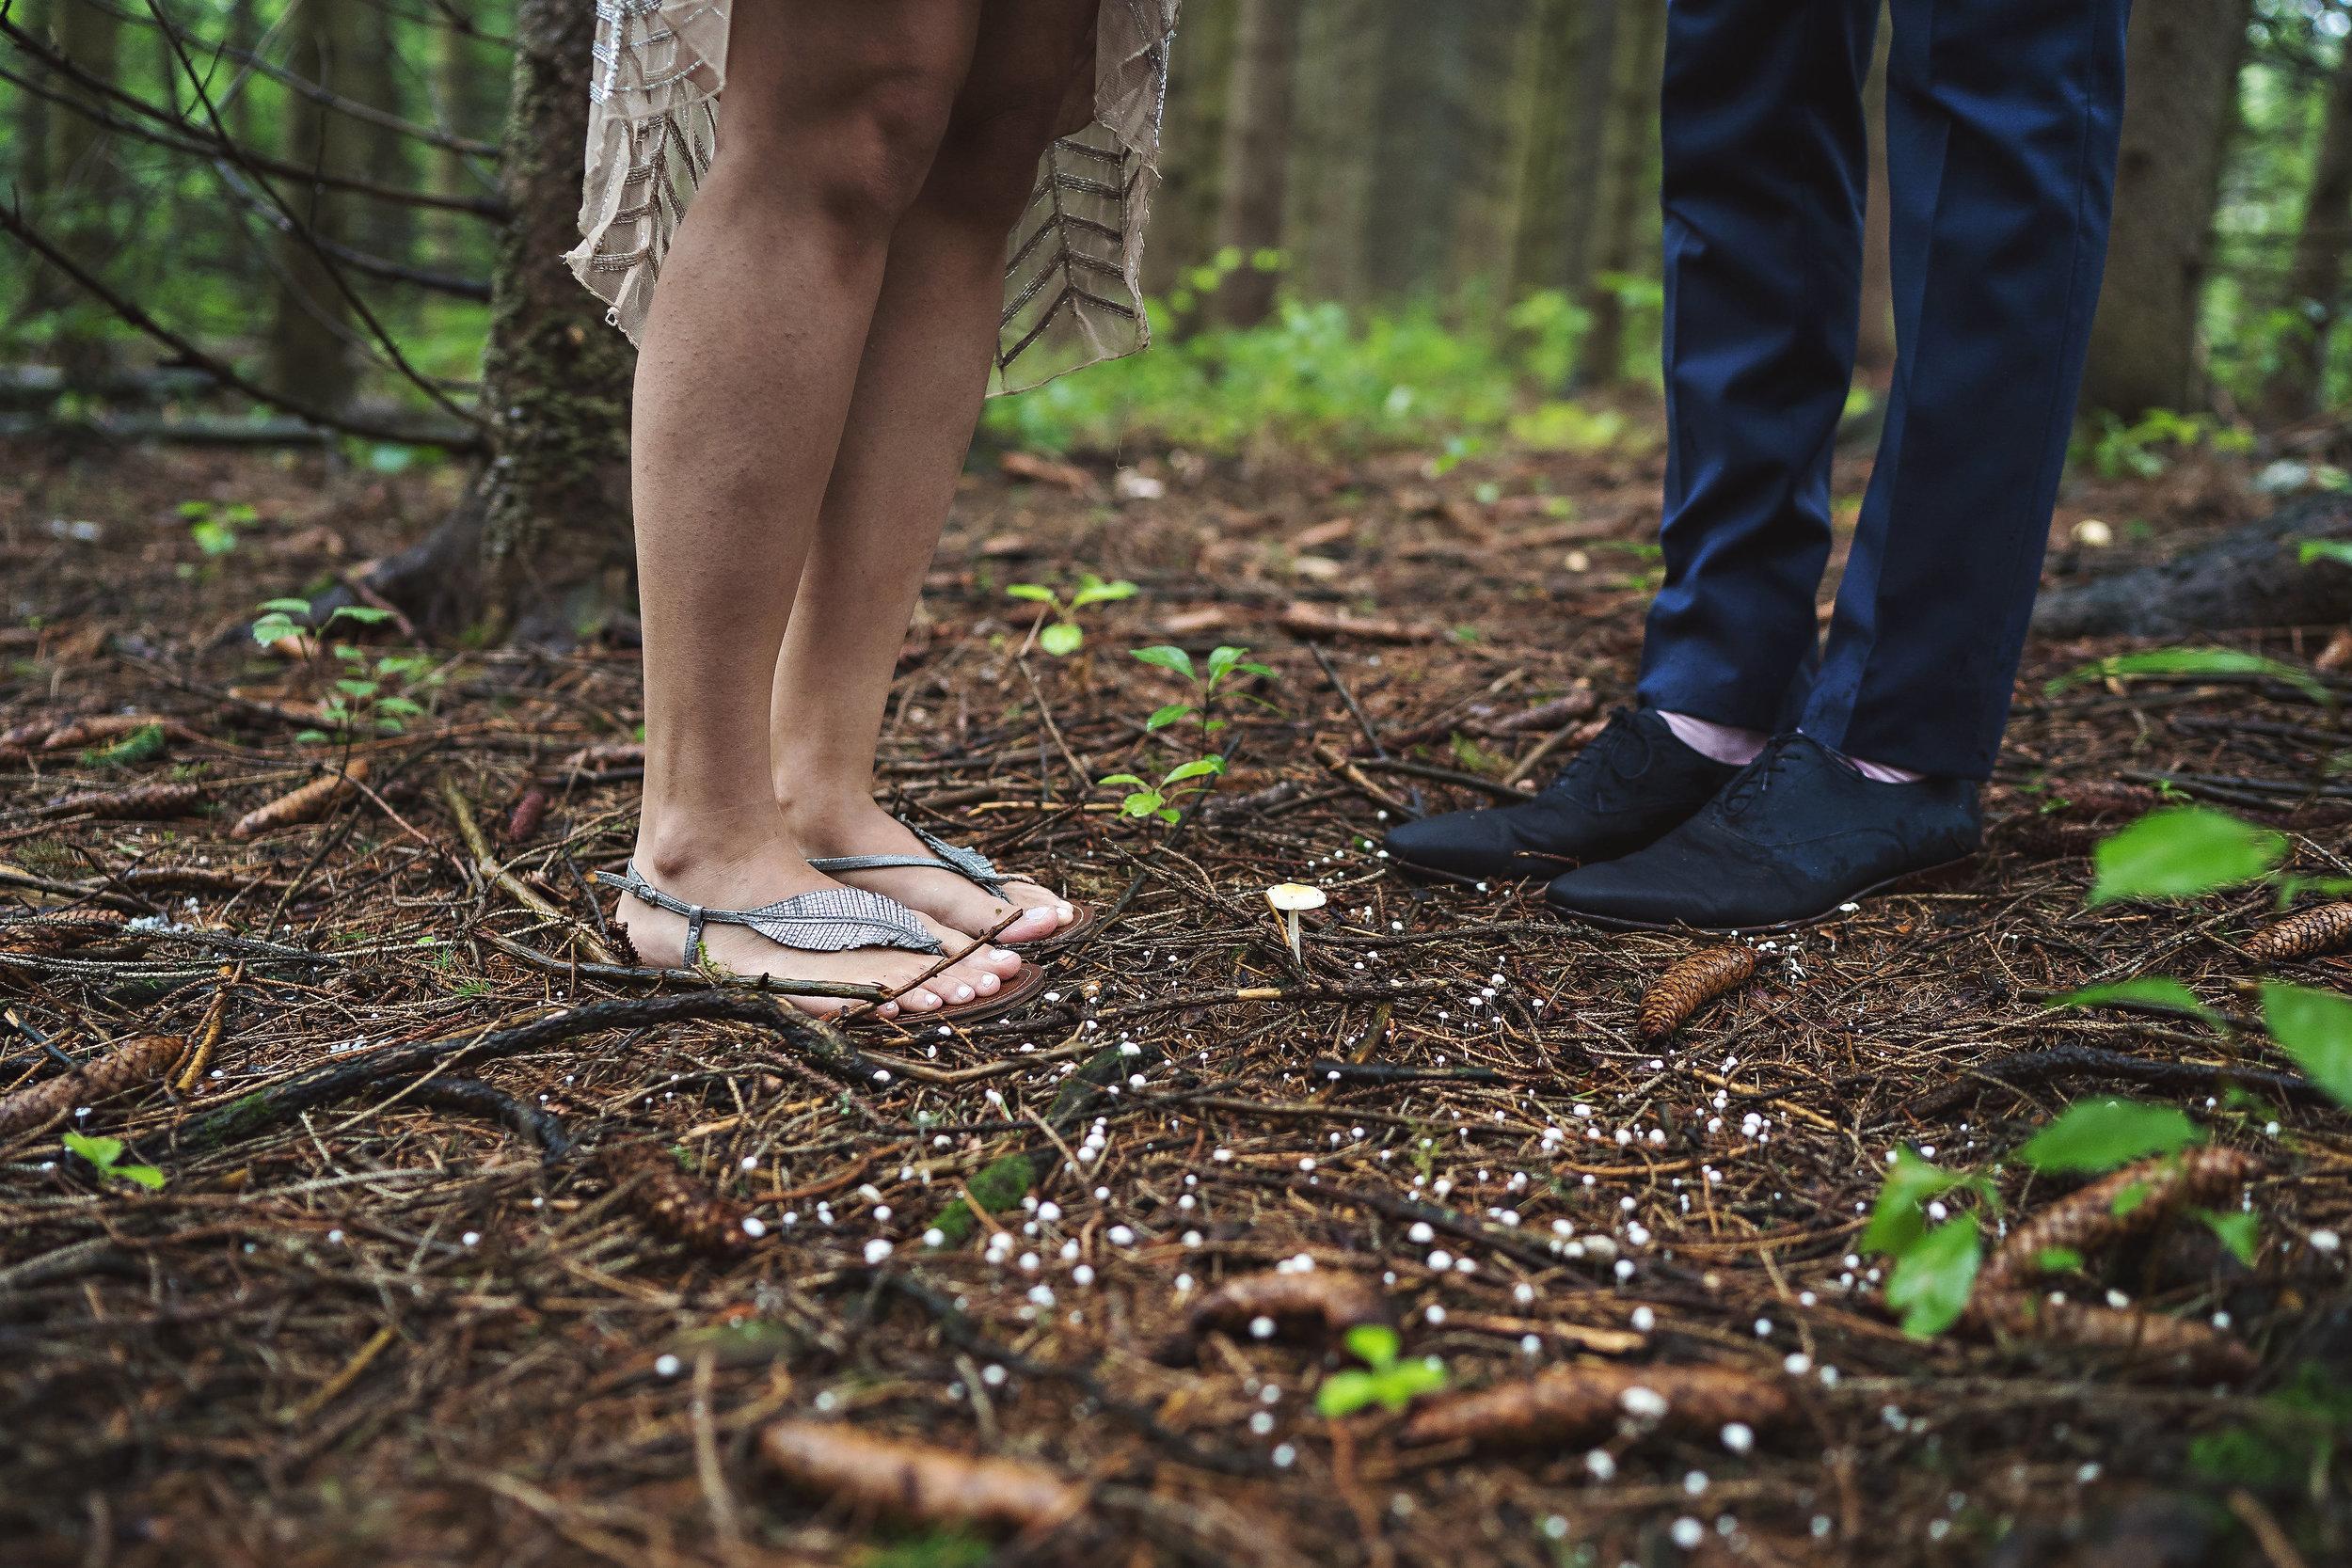 upstate-ny-wedding-jove-meyer-events-inbal-sivan-094.jpg